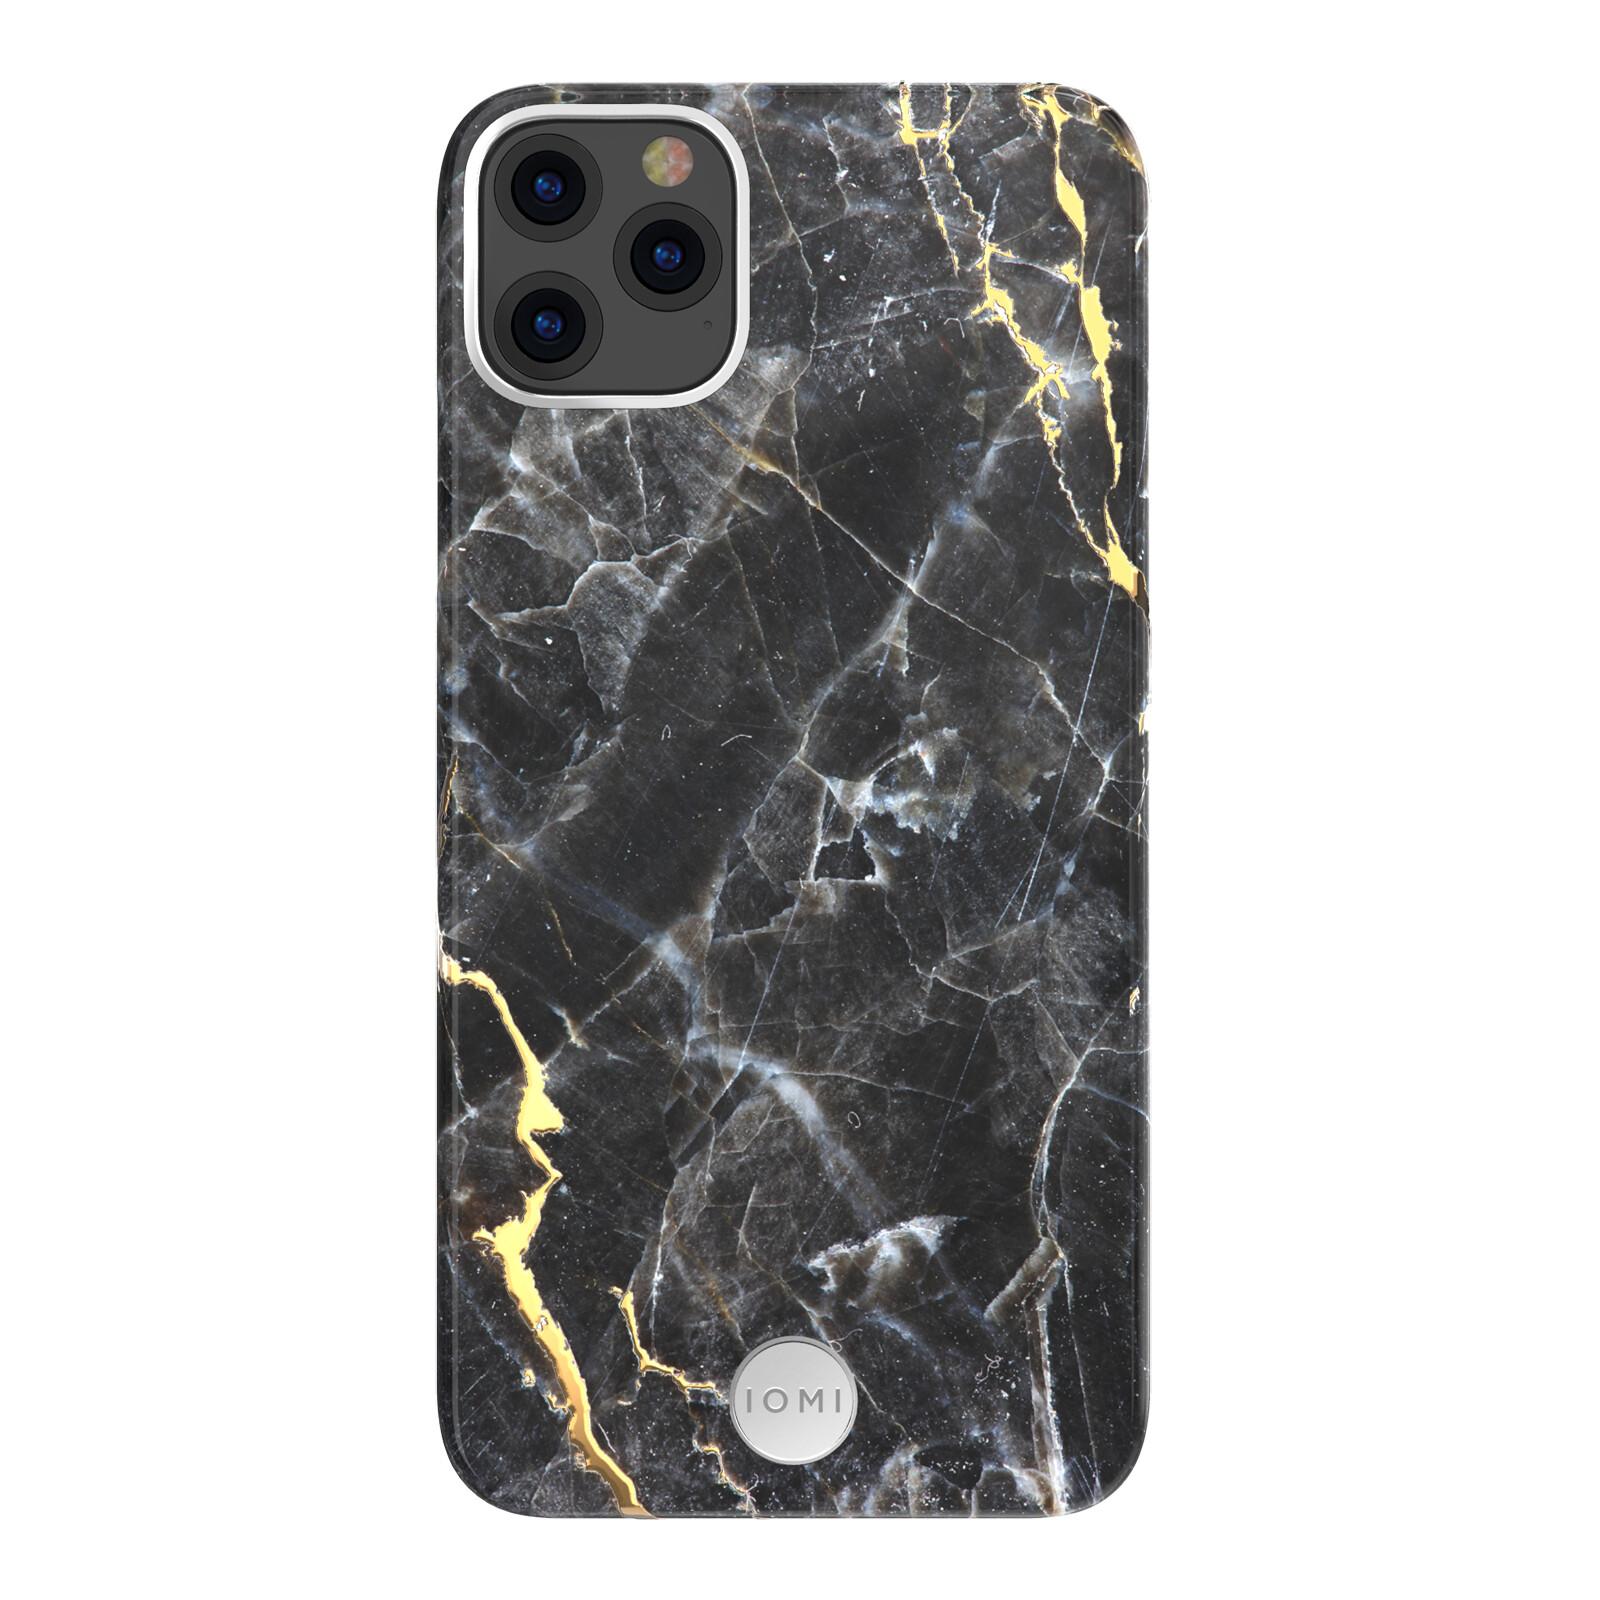 IOMI Back Design Apple iPhone 11 Pro marble black